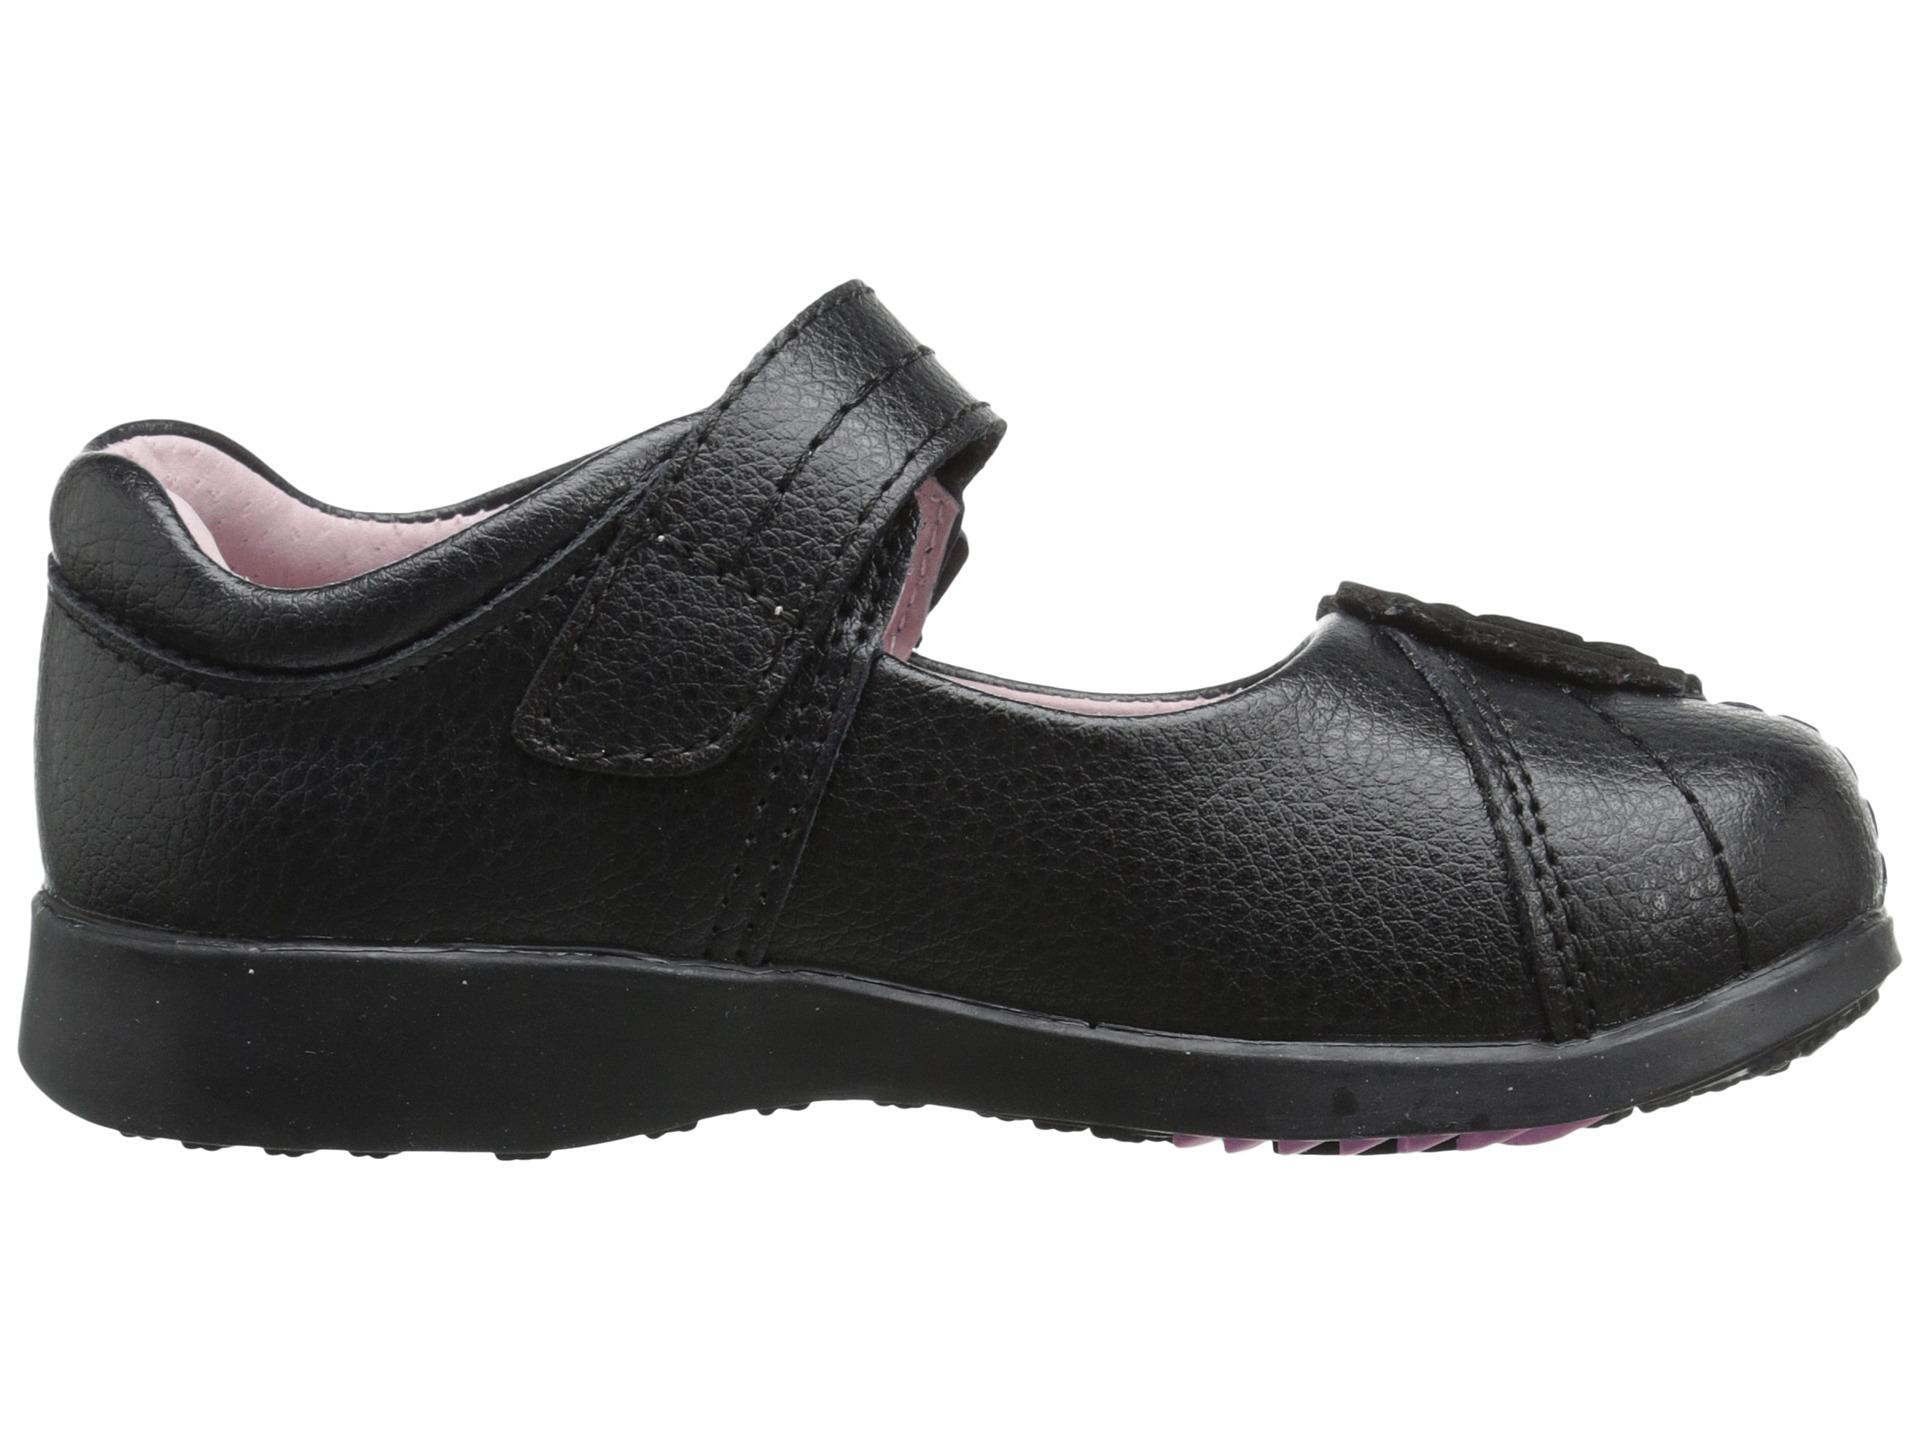 Pediped Women S Shoes